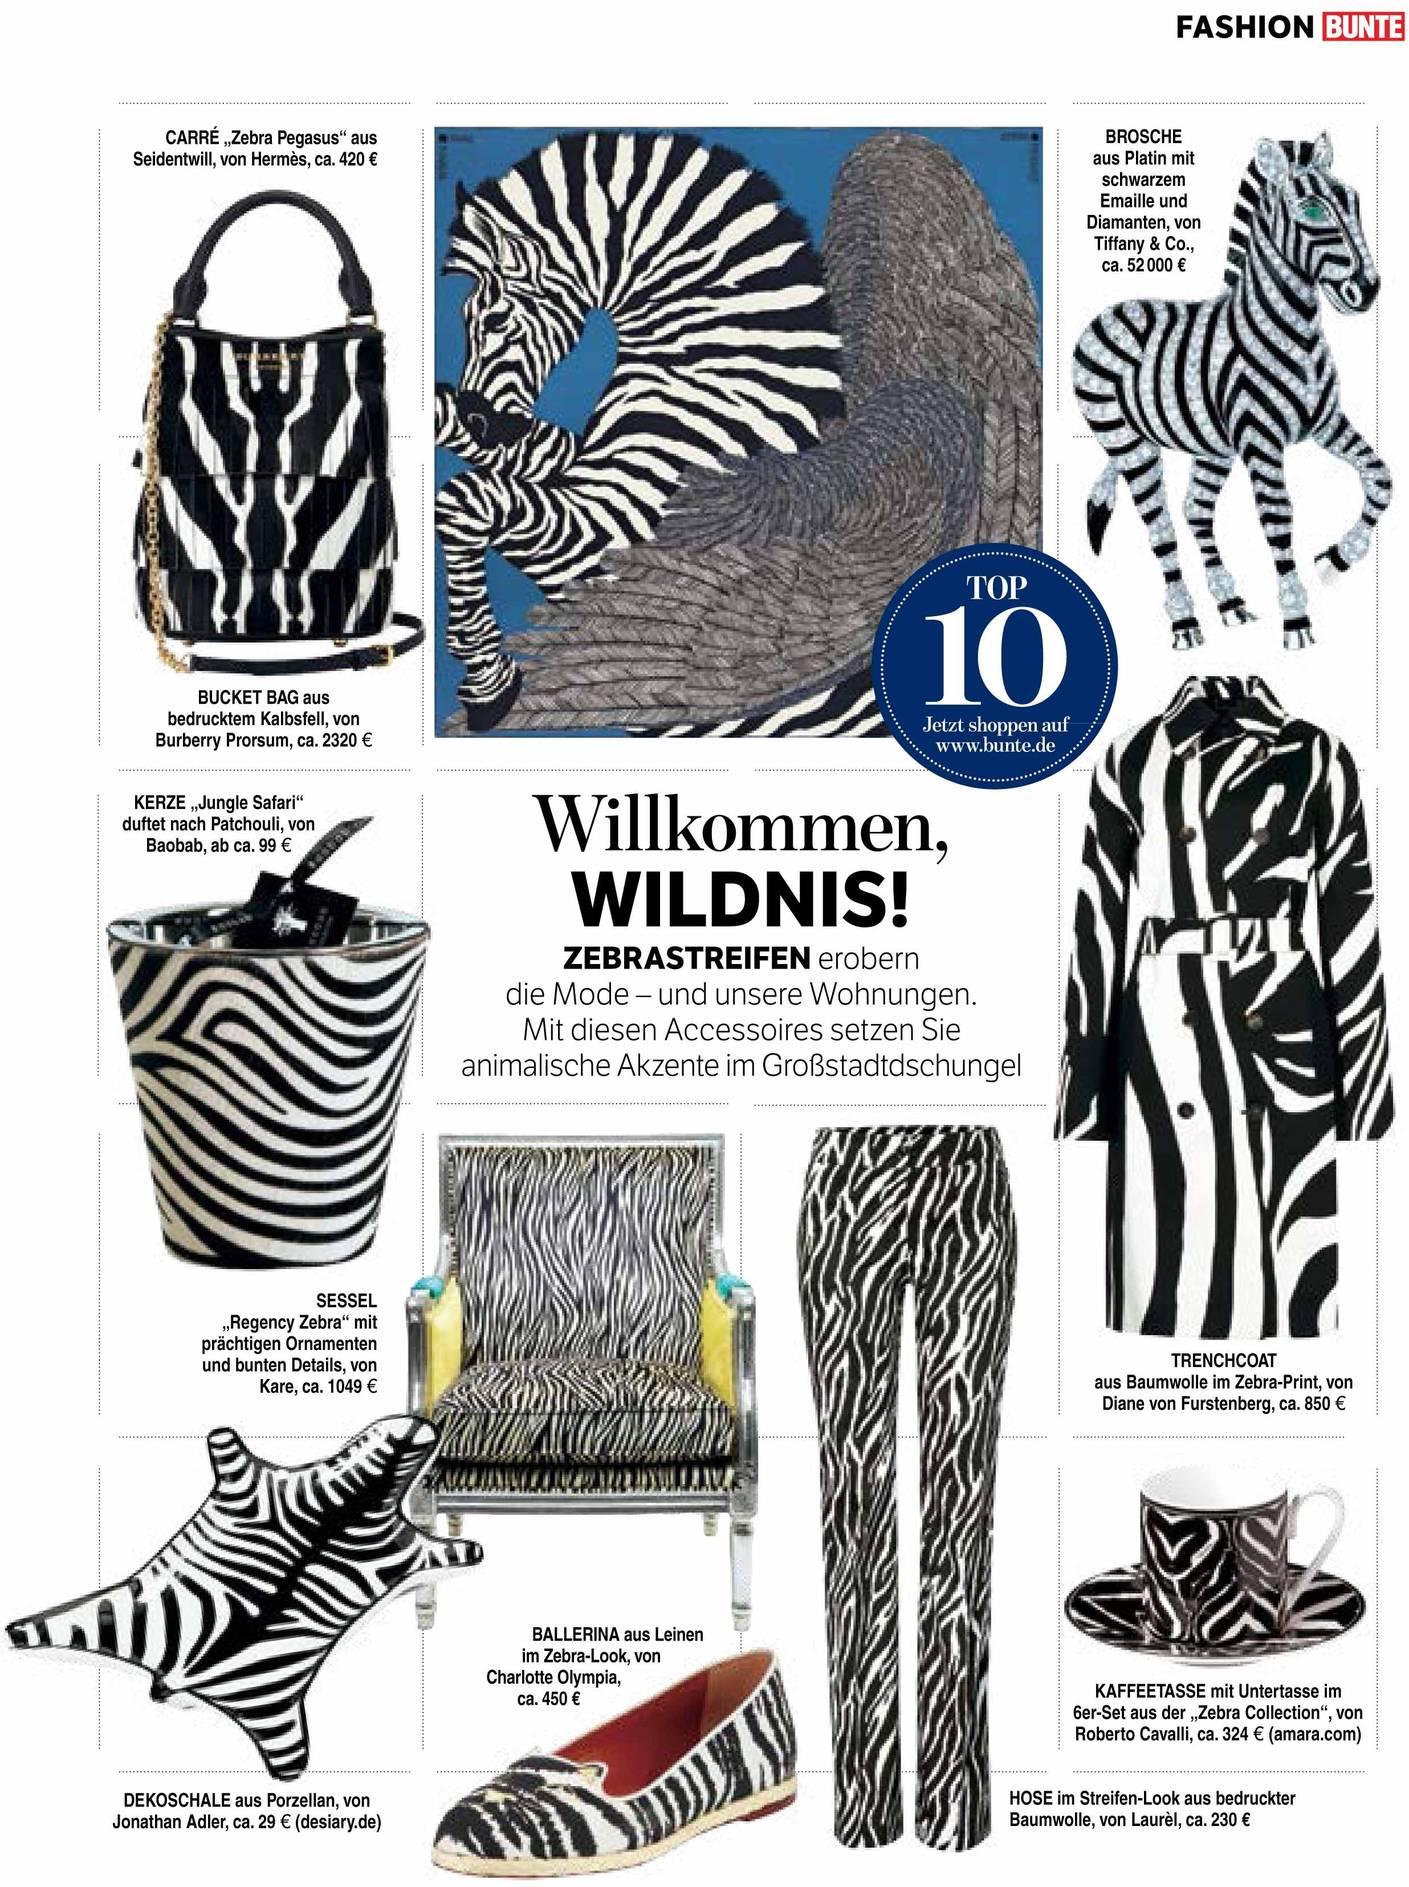 zebra look - kare ukraine